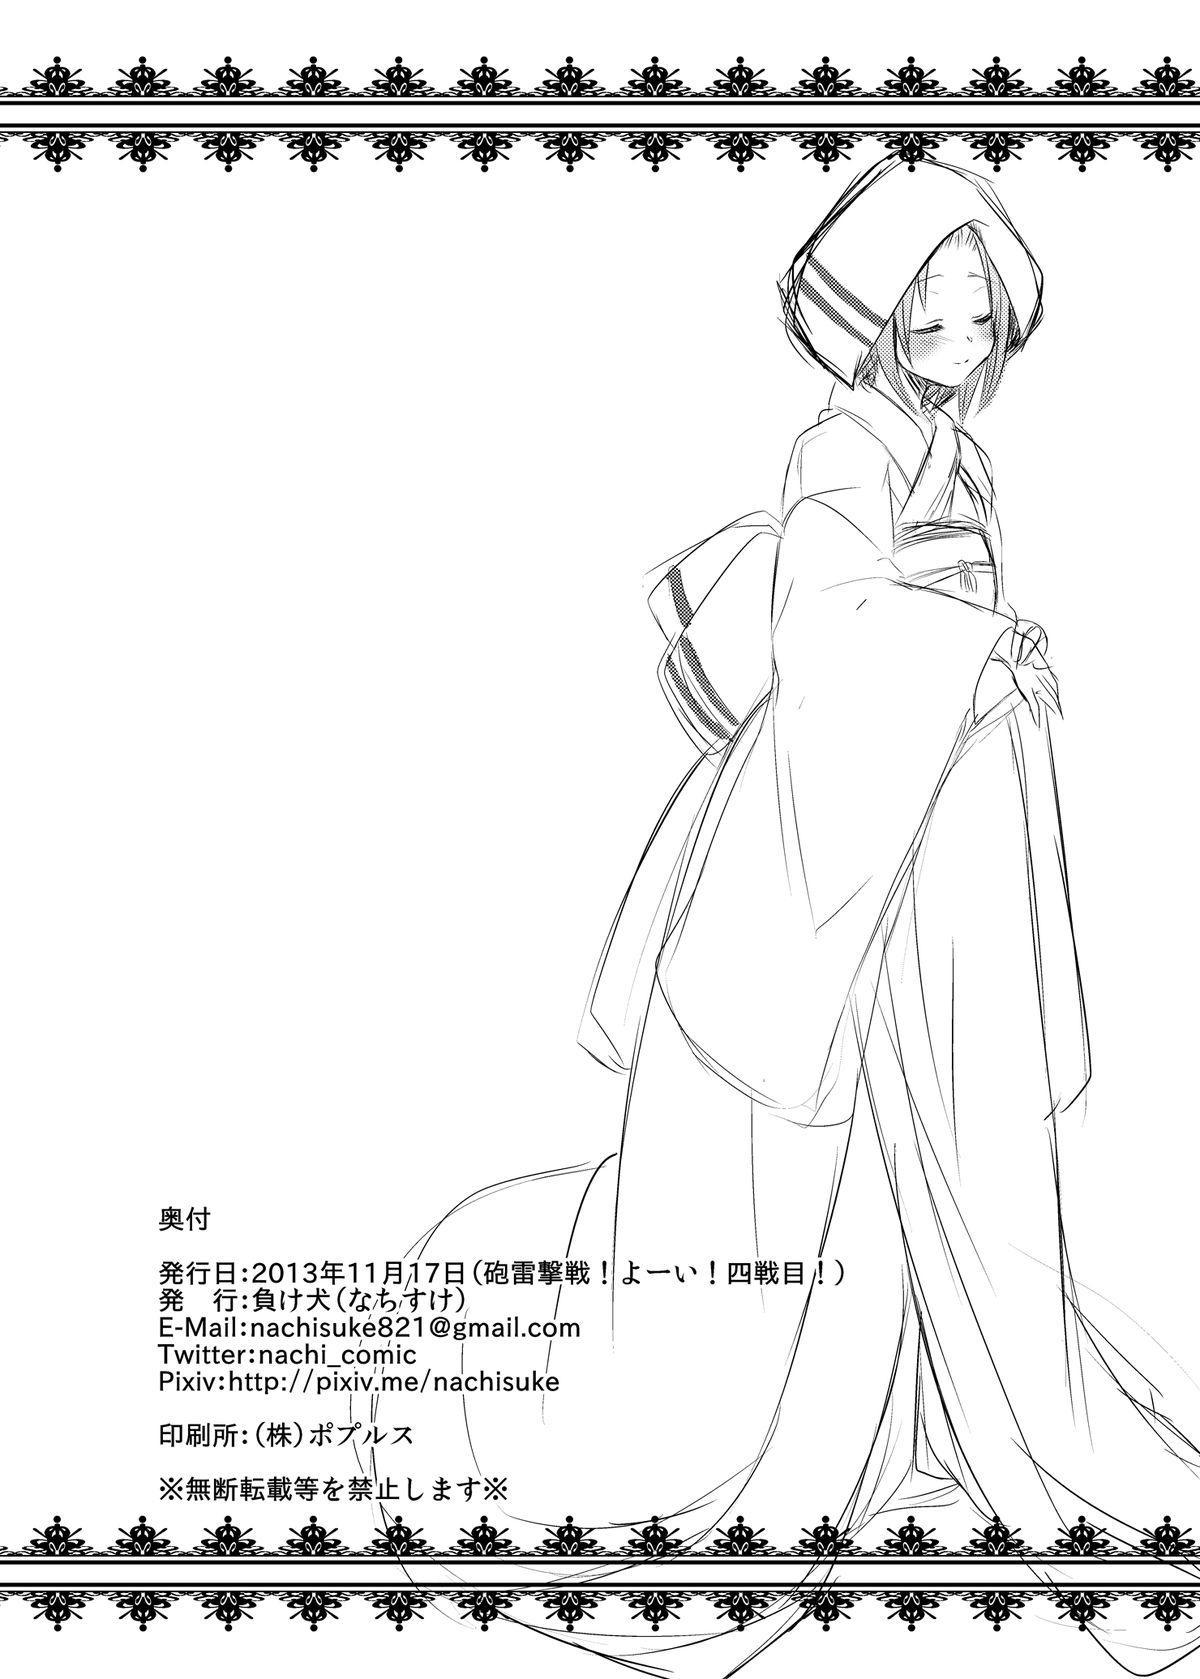 Zuihou-chan wo Kowareru Hodo Dakishimetai 23